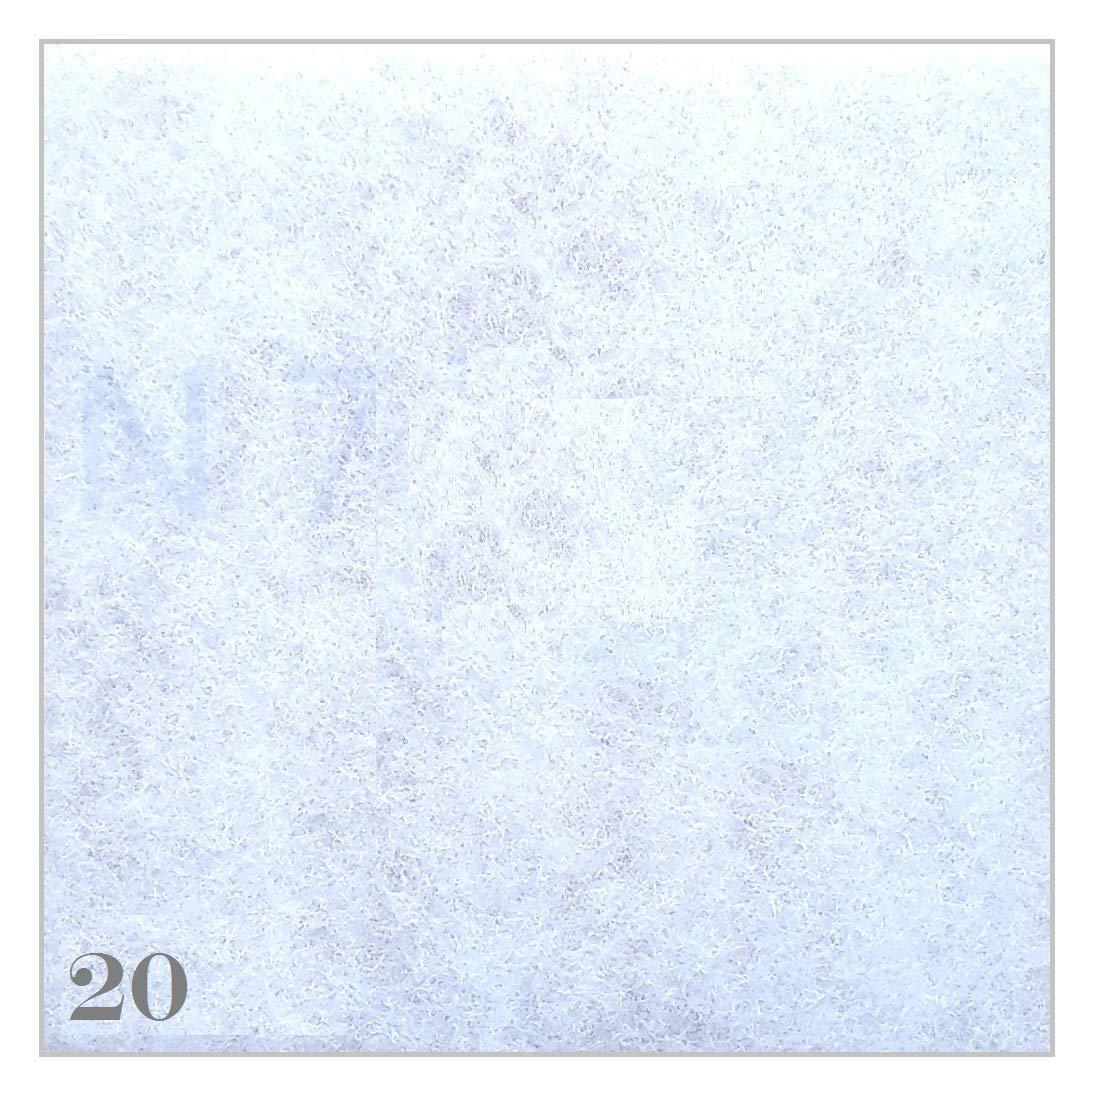 20 Filter Ersatzfilter fü r Meltem Lü fter Ventilator Serie G4 ab Bj 92 -150x150 mm - Filterklasse G2 - GF 0198 RG Filtermedien